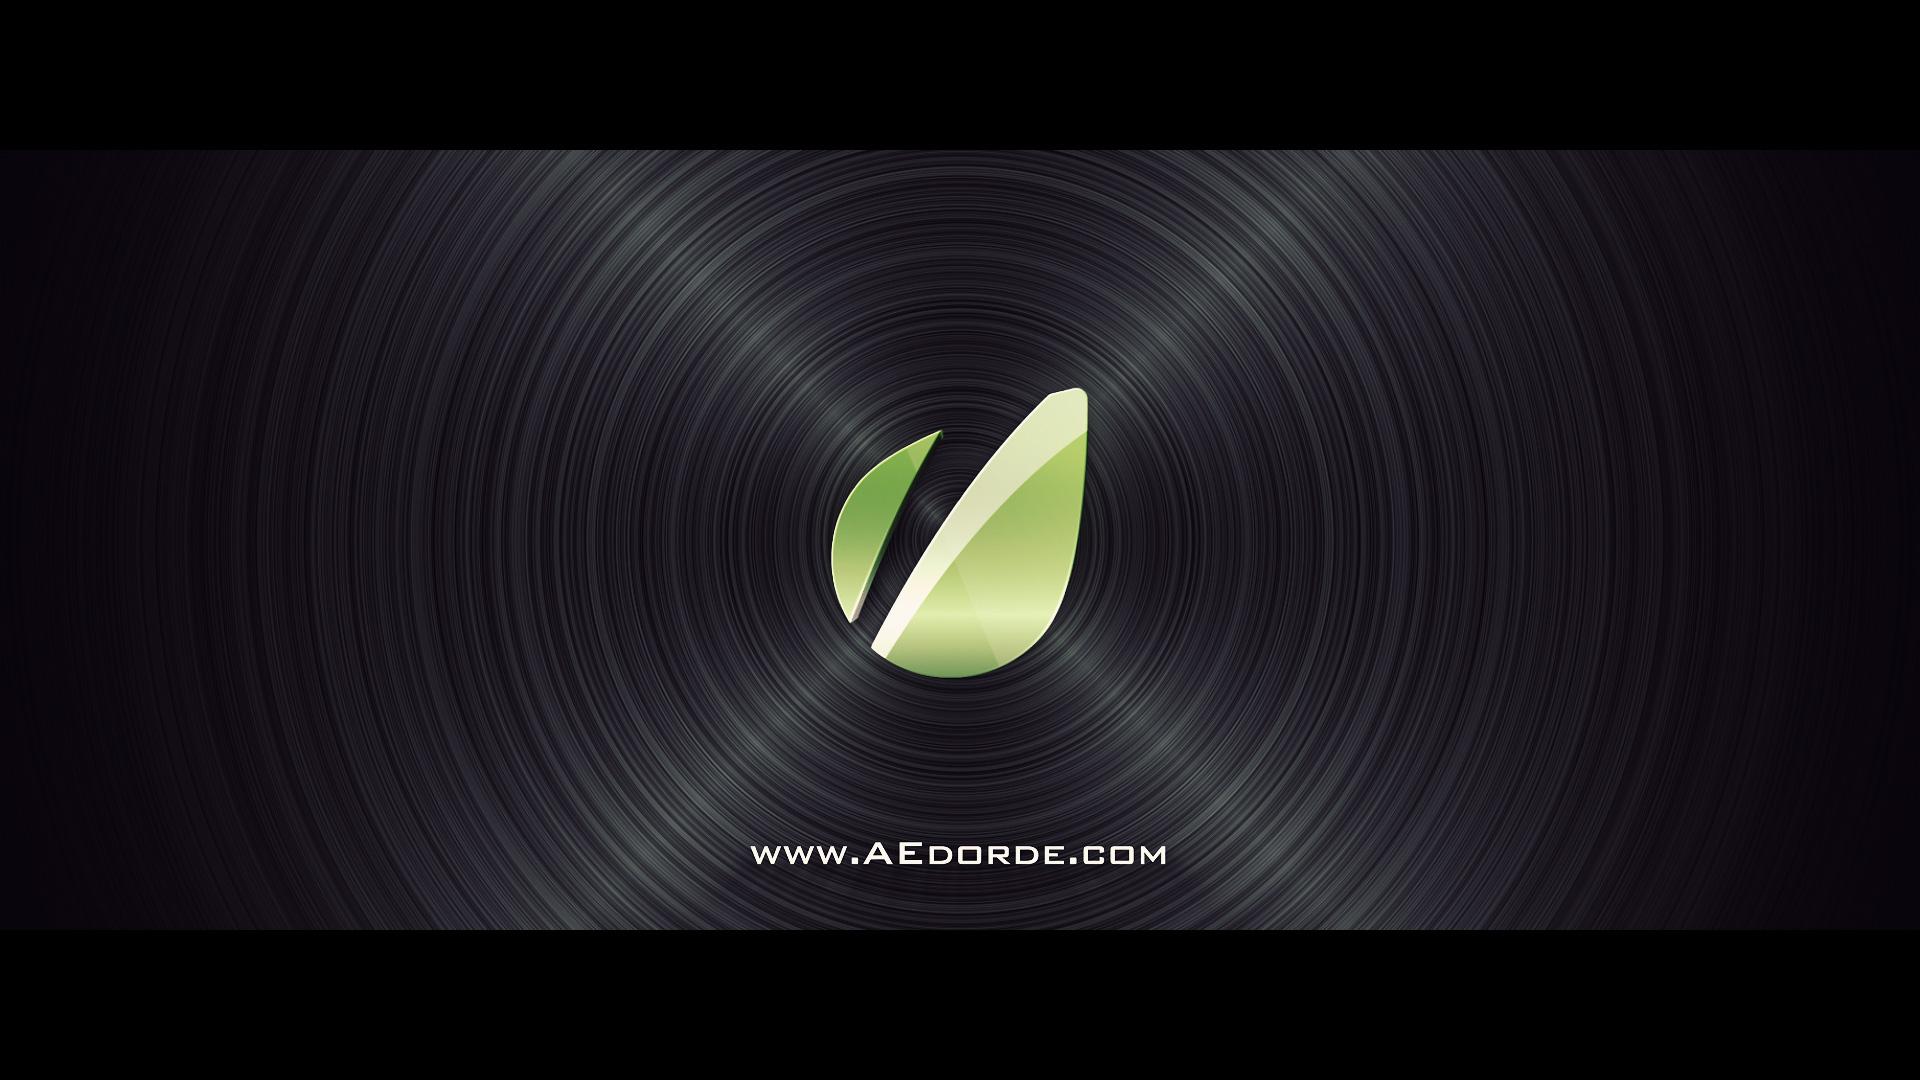 Damaged glitch logo intro – 3in1 pack